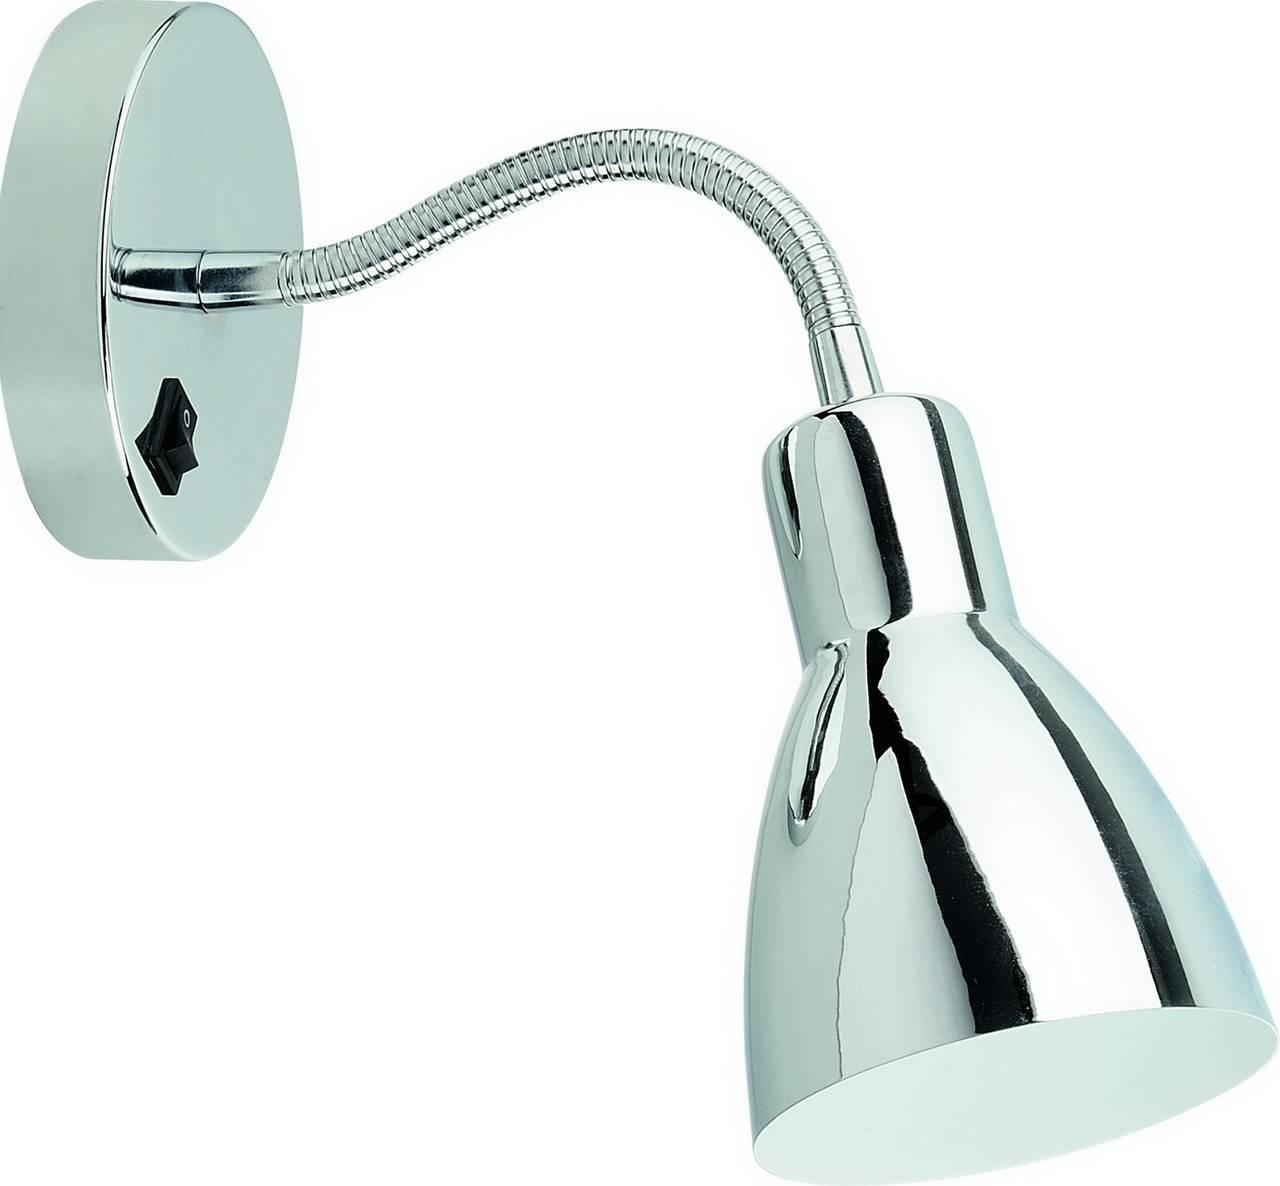 Спот Arte Lamp, E14, 40 Вт arte lamp бра arte lamp dorm a1408ap 1cc